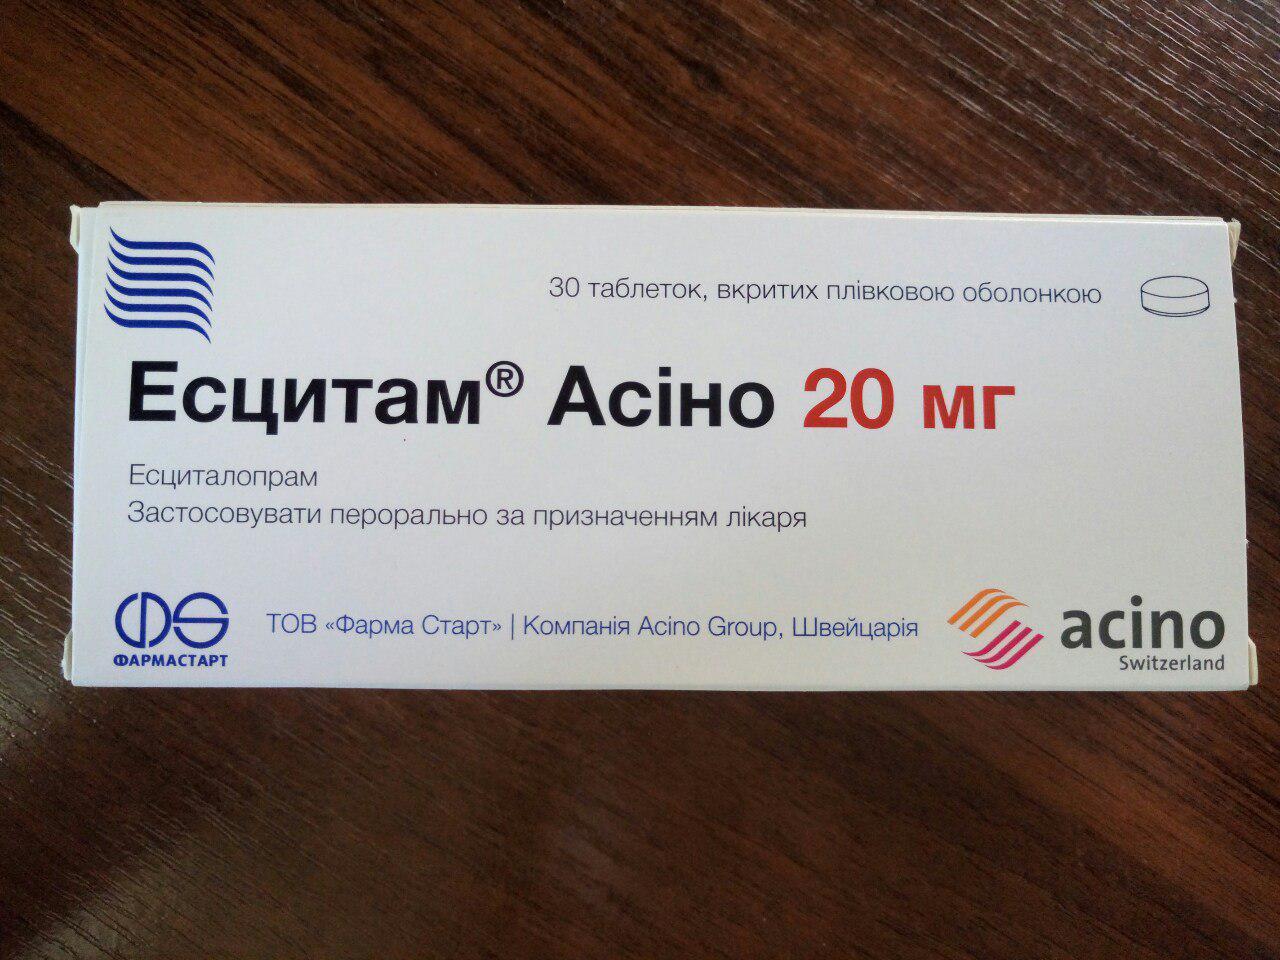 8543 ЕСЦИТАМ® АСІНО - Escitalopram